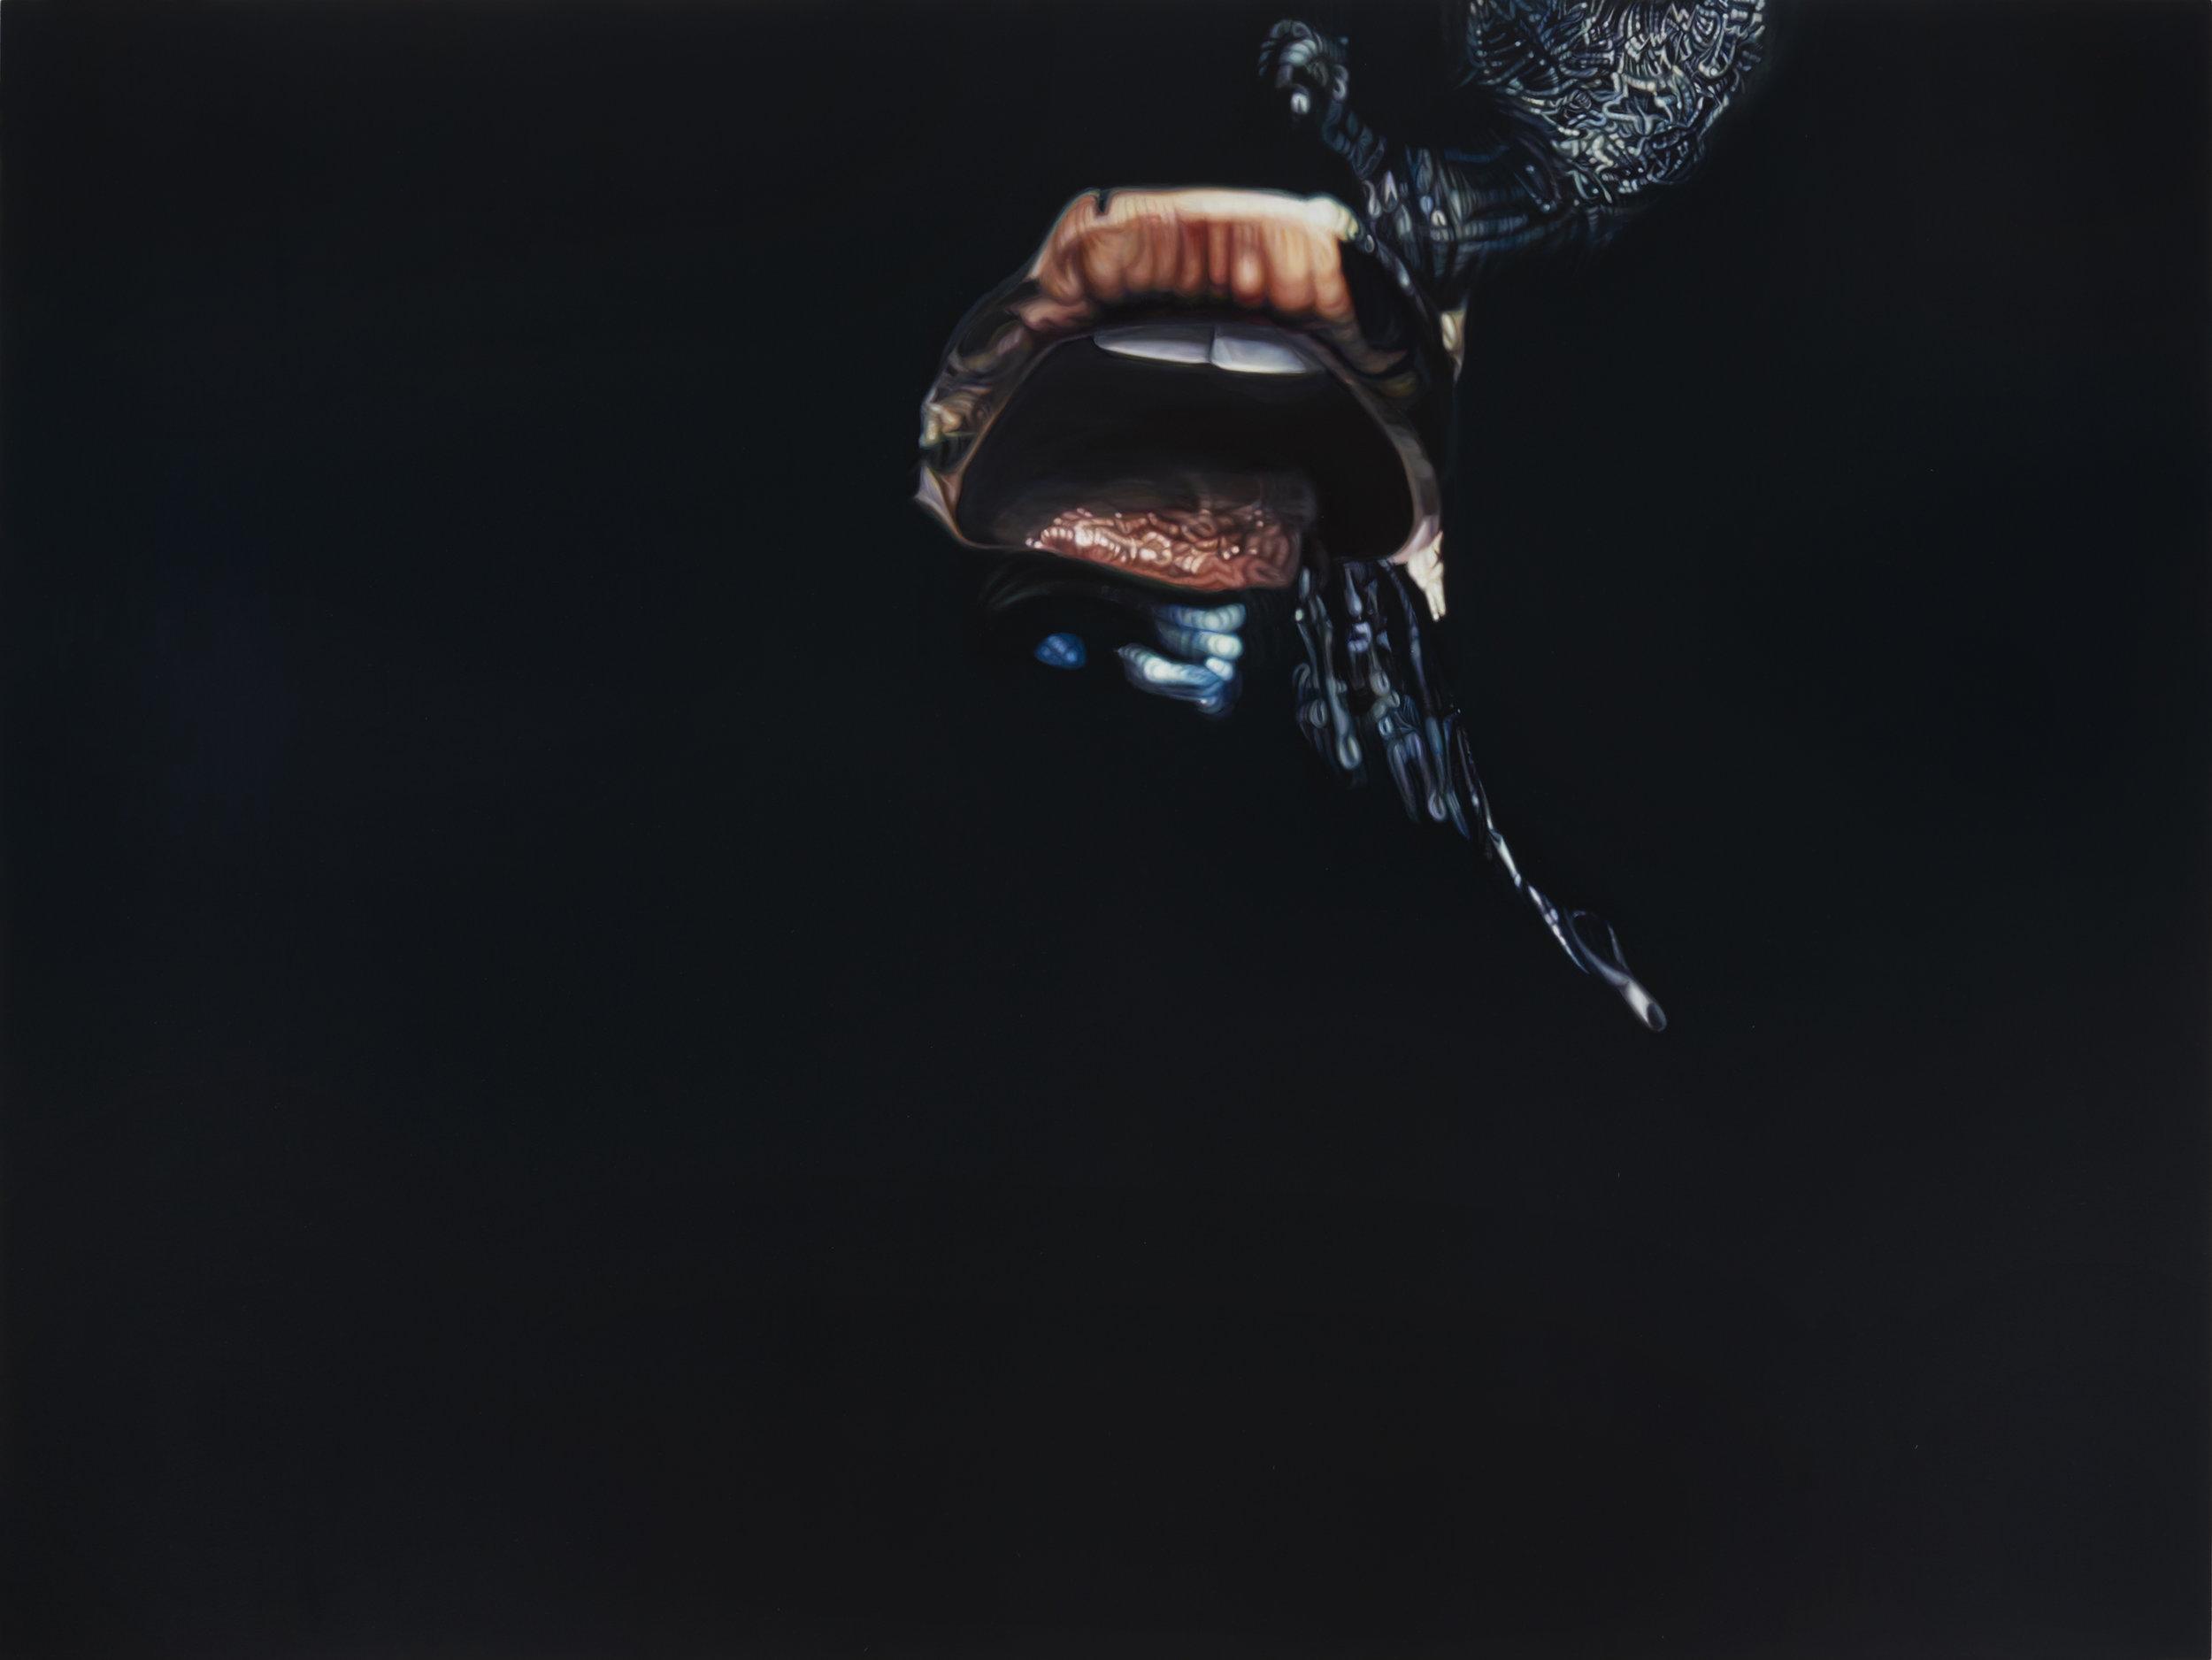 Ana Teresa Fernández,  Erasure 2 (performance documentation) , 2016, Oil on canvas, 72 x 98 inches (183 x 249 cm)